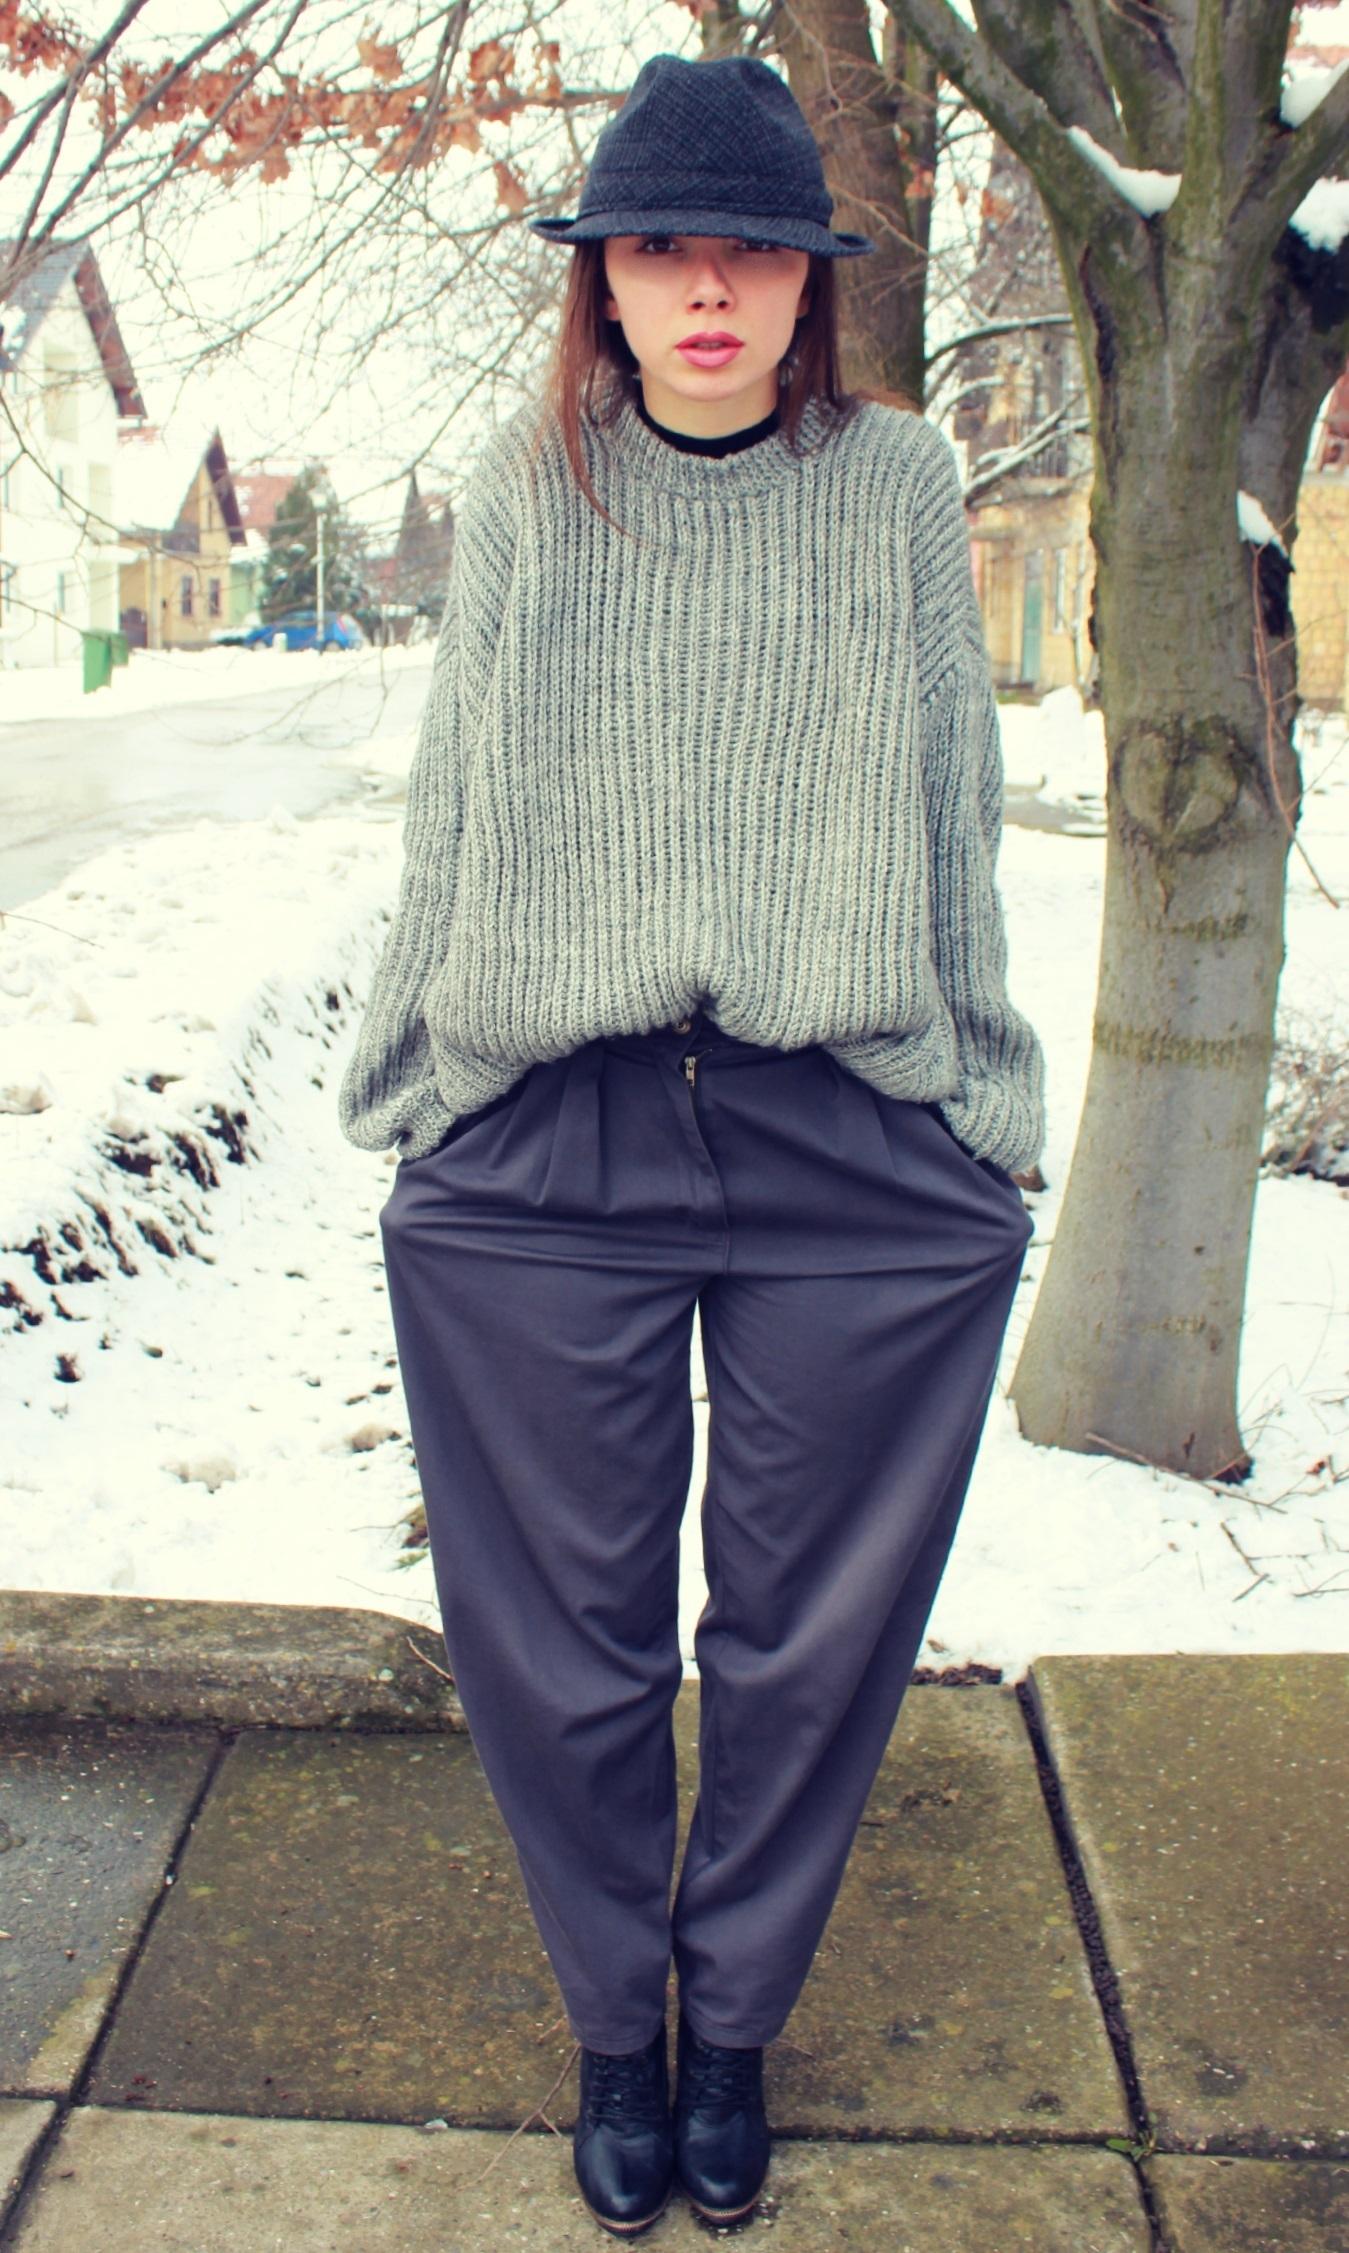 How to Wear a Grey Knit Oversized Sweater (67 looks) | Women's Fashion